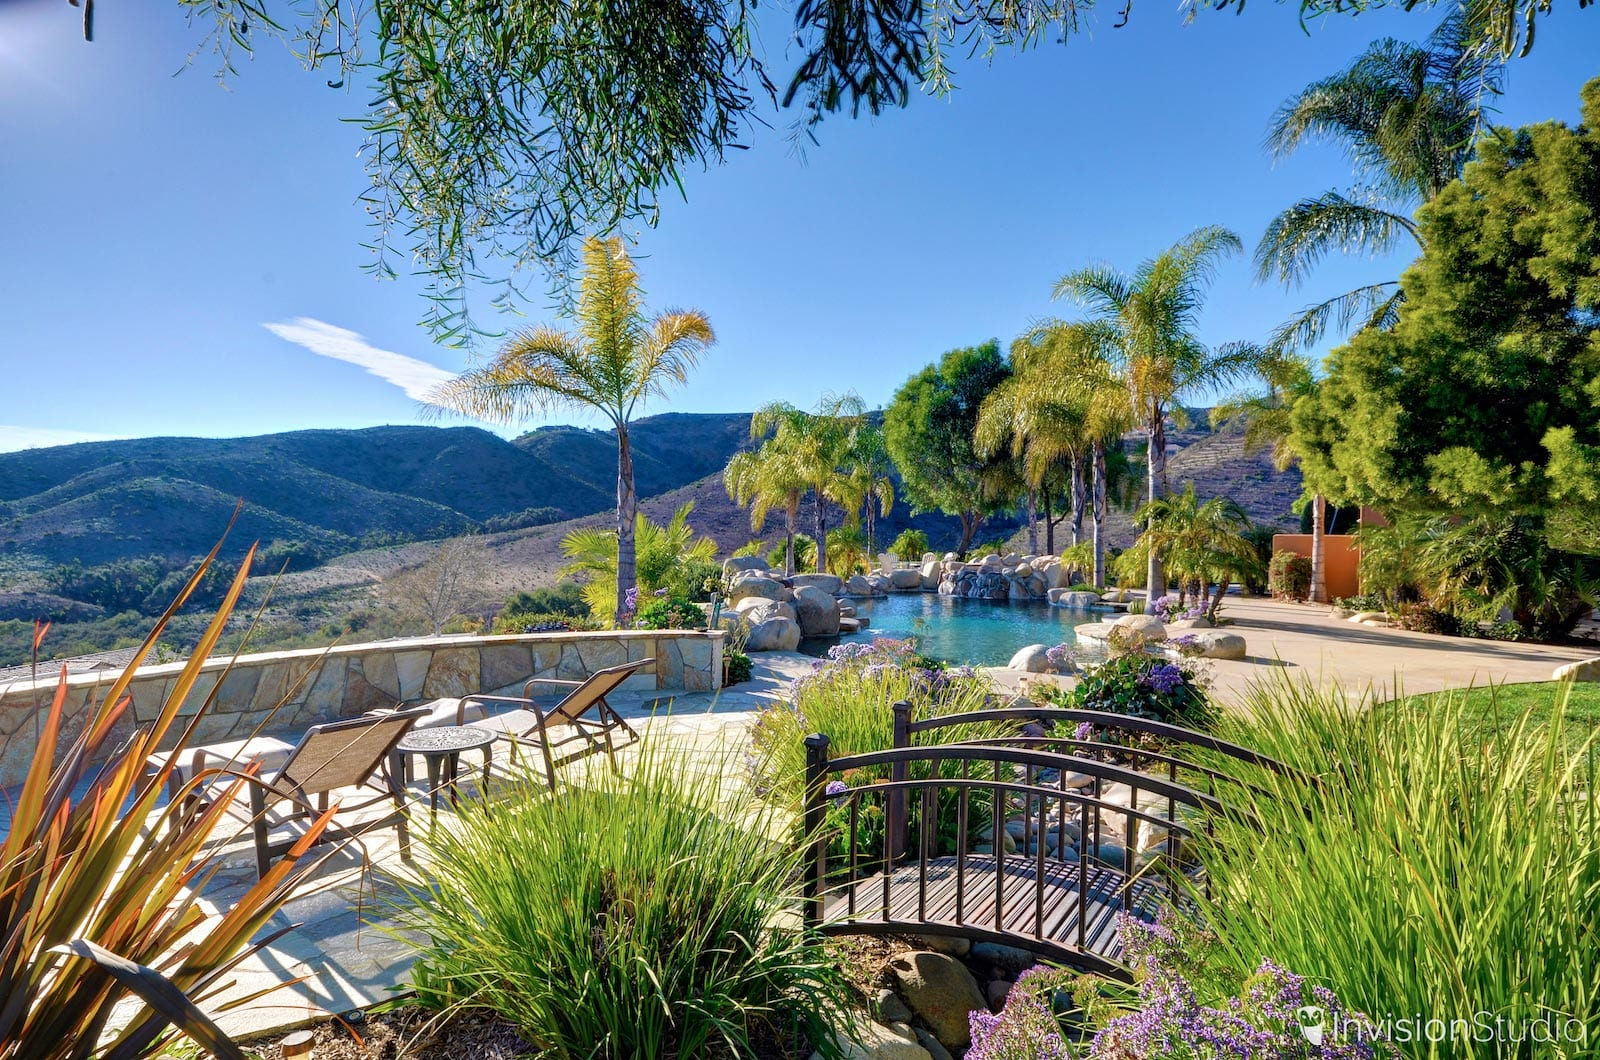 Backyard View of San Diego, Ca Property | 360 Virtual Tour Photographer San Diego | 360 Photography Services San Diego | 360 Panoramic Photography San Diego